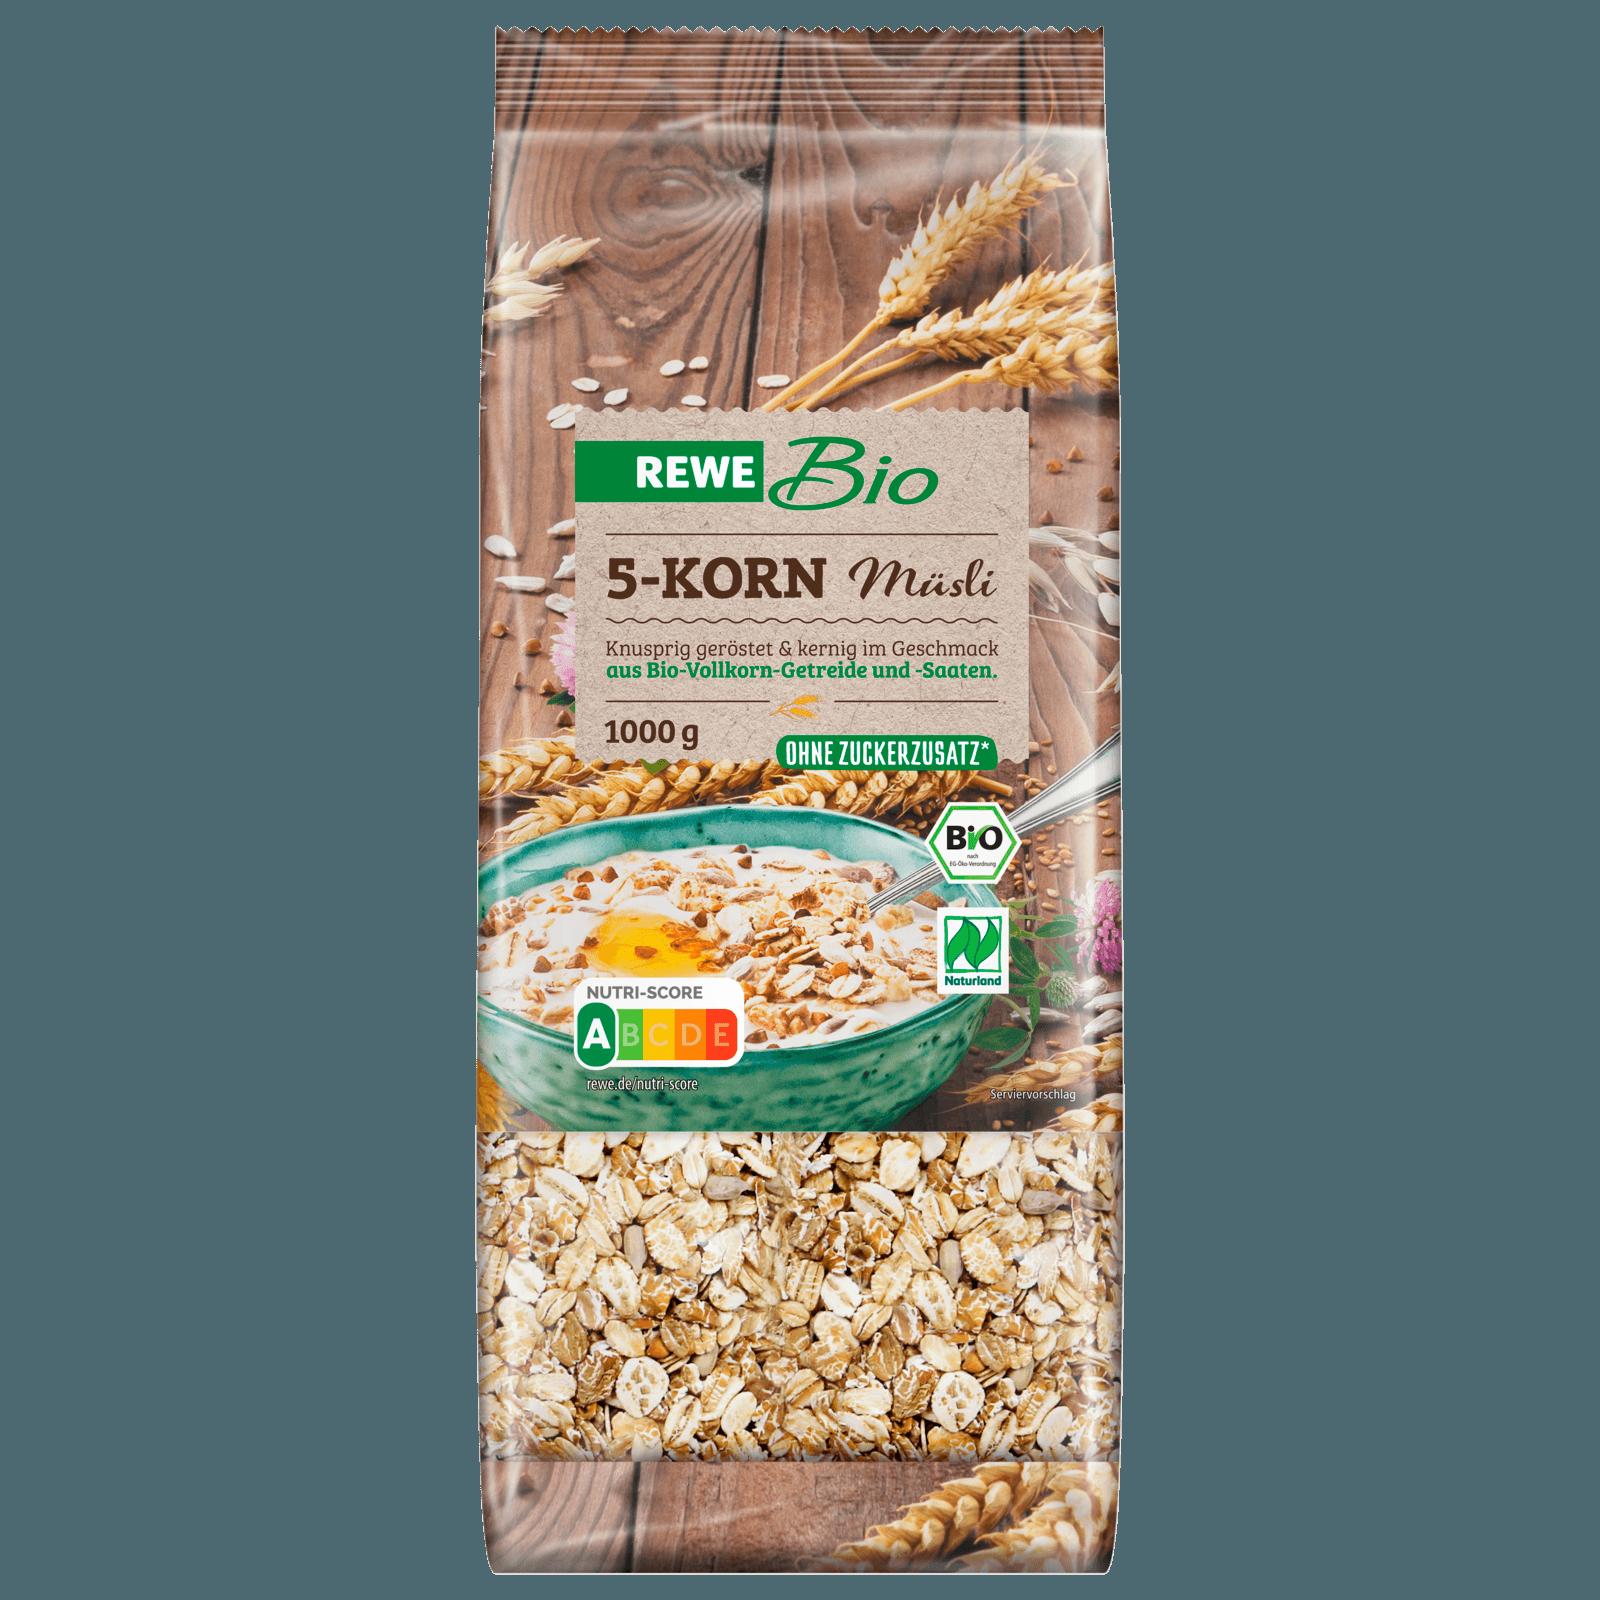 REWE Bio 5-Korn-Müsli 1kg bei REWE online bestellen!